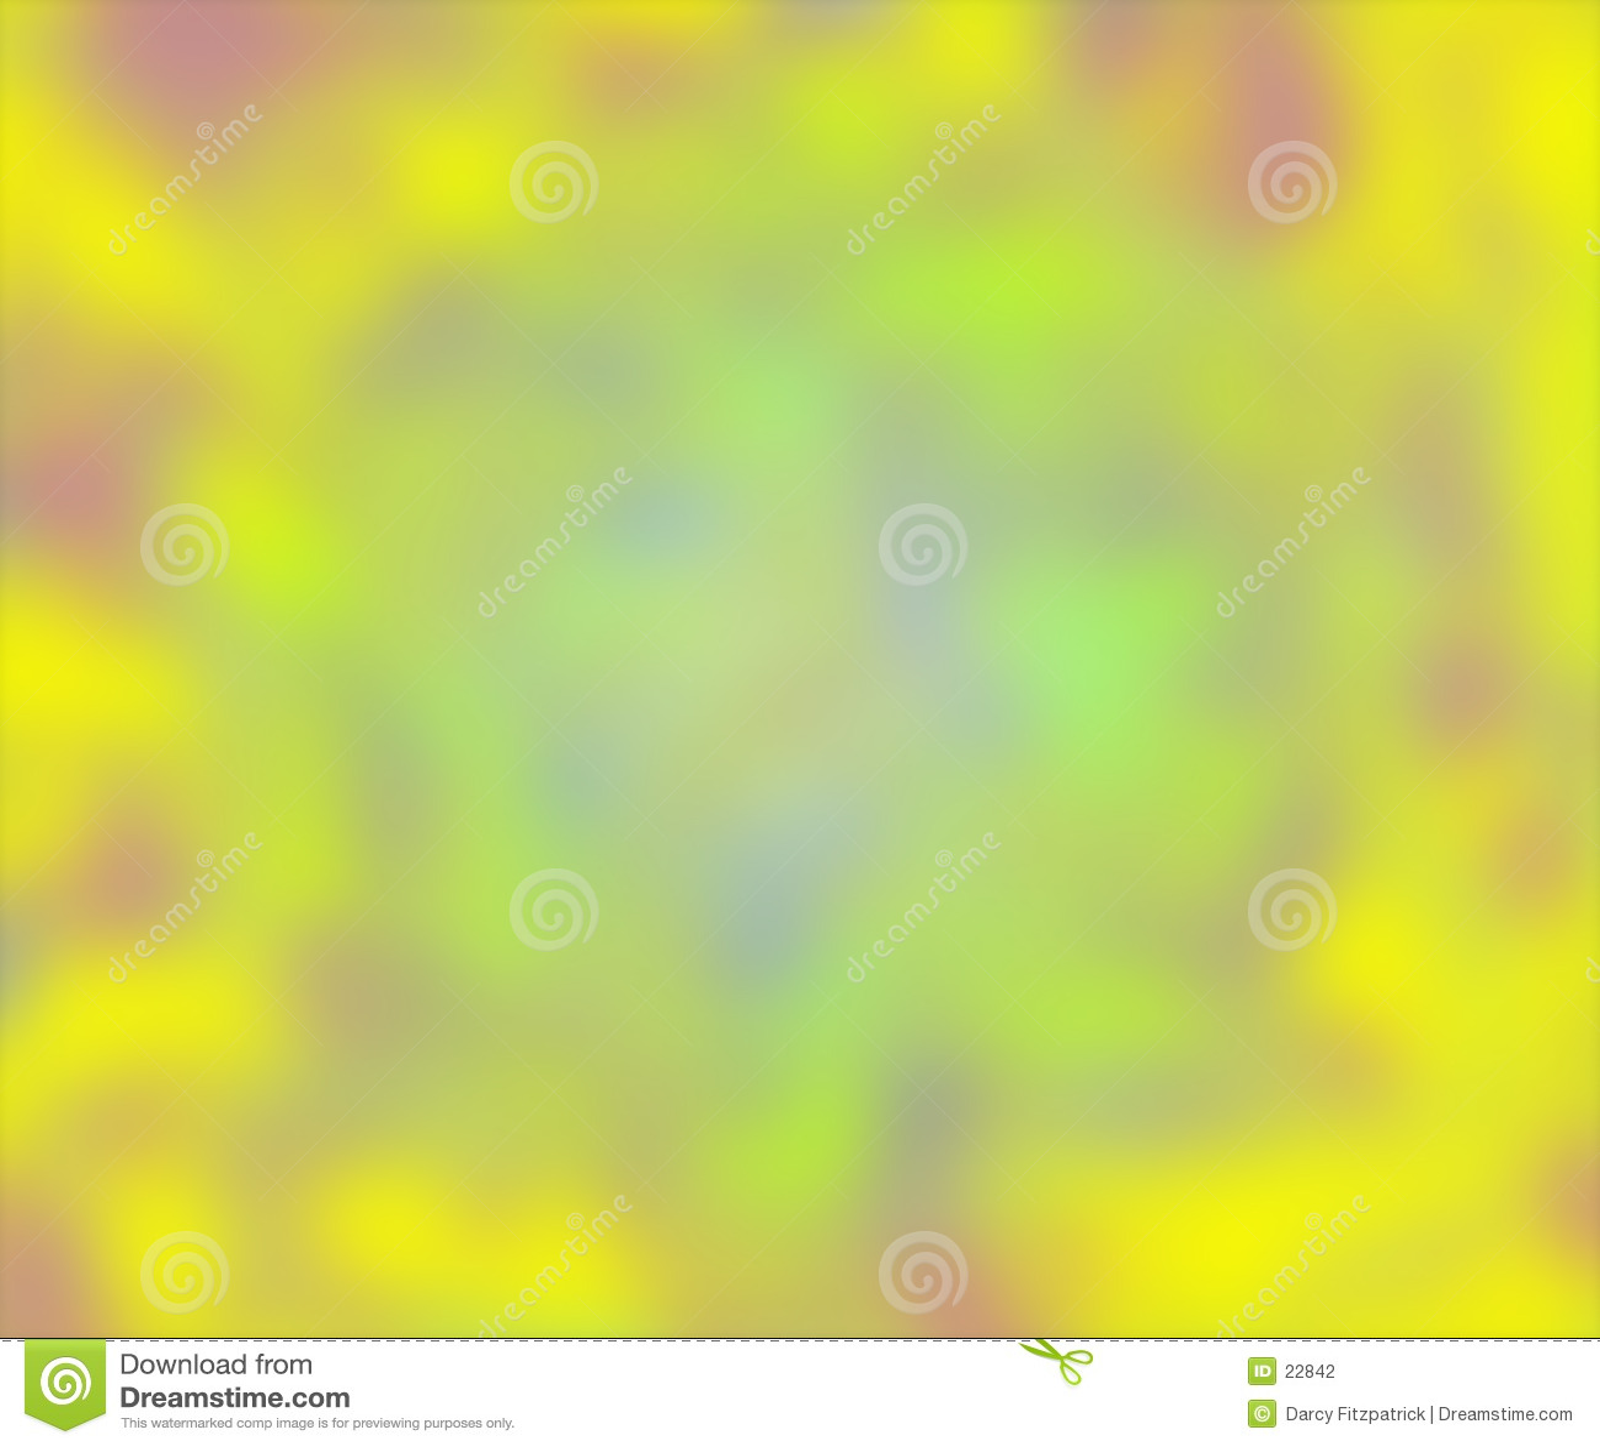 Zachte pastelkleursamenvatting